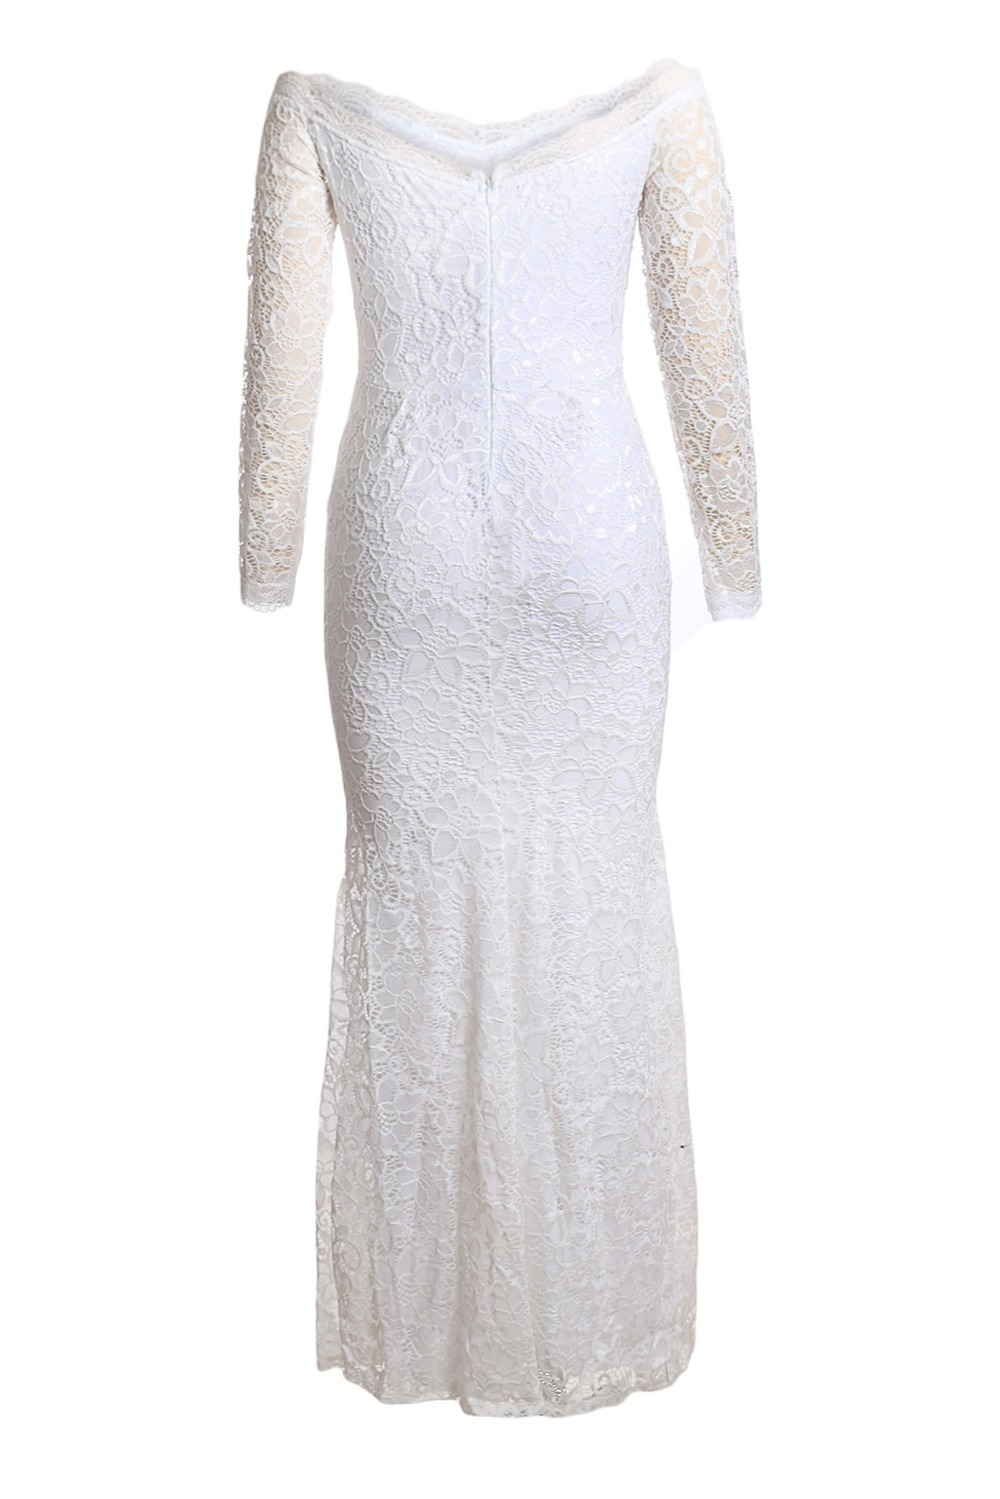 f273f55ff4d Dear lover Summer 2017 Plus Size Formal Party Dress Blue High Low Hem Off  Shoulder Women Maxi Dress Vestidos Elegant LC61437USD 32.23 piece